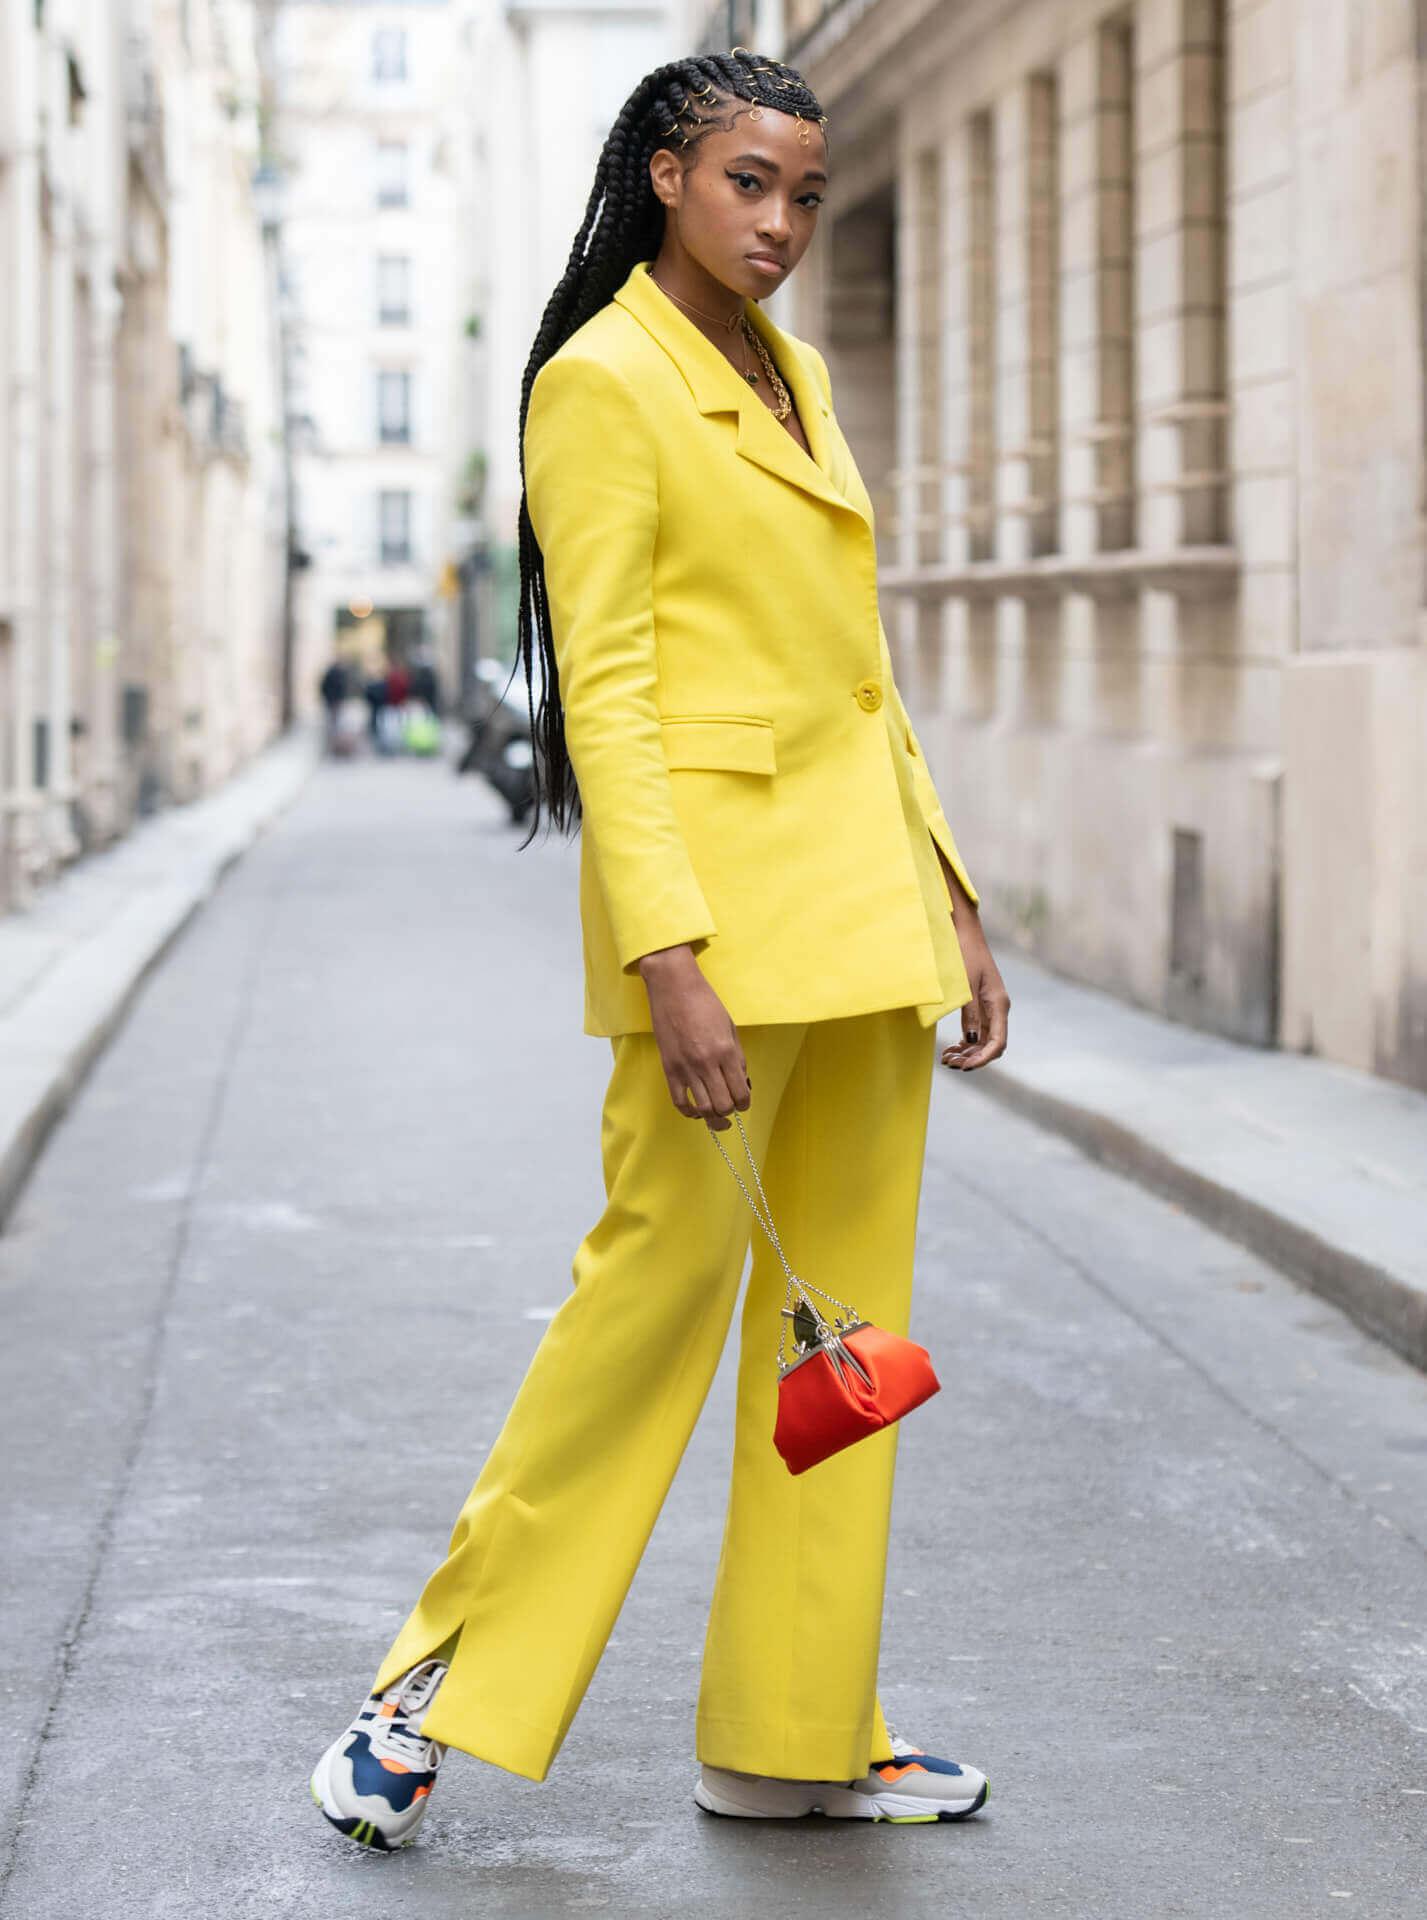 Le mini bag - Candace Marie Stewart, Streetstyle